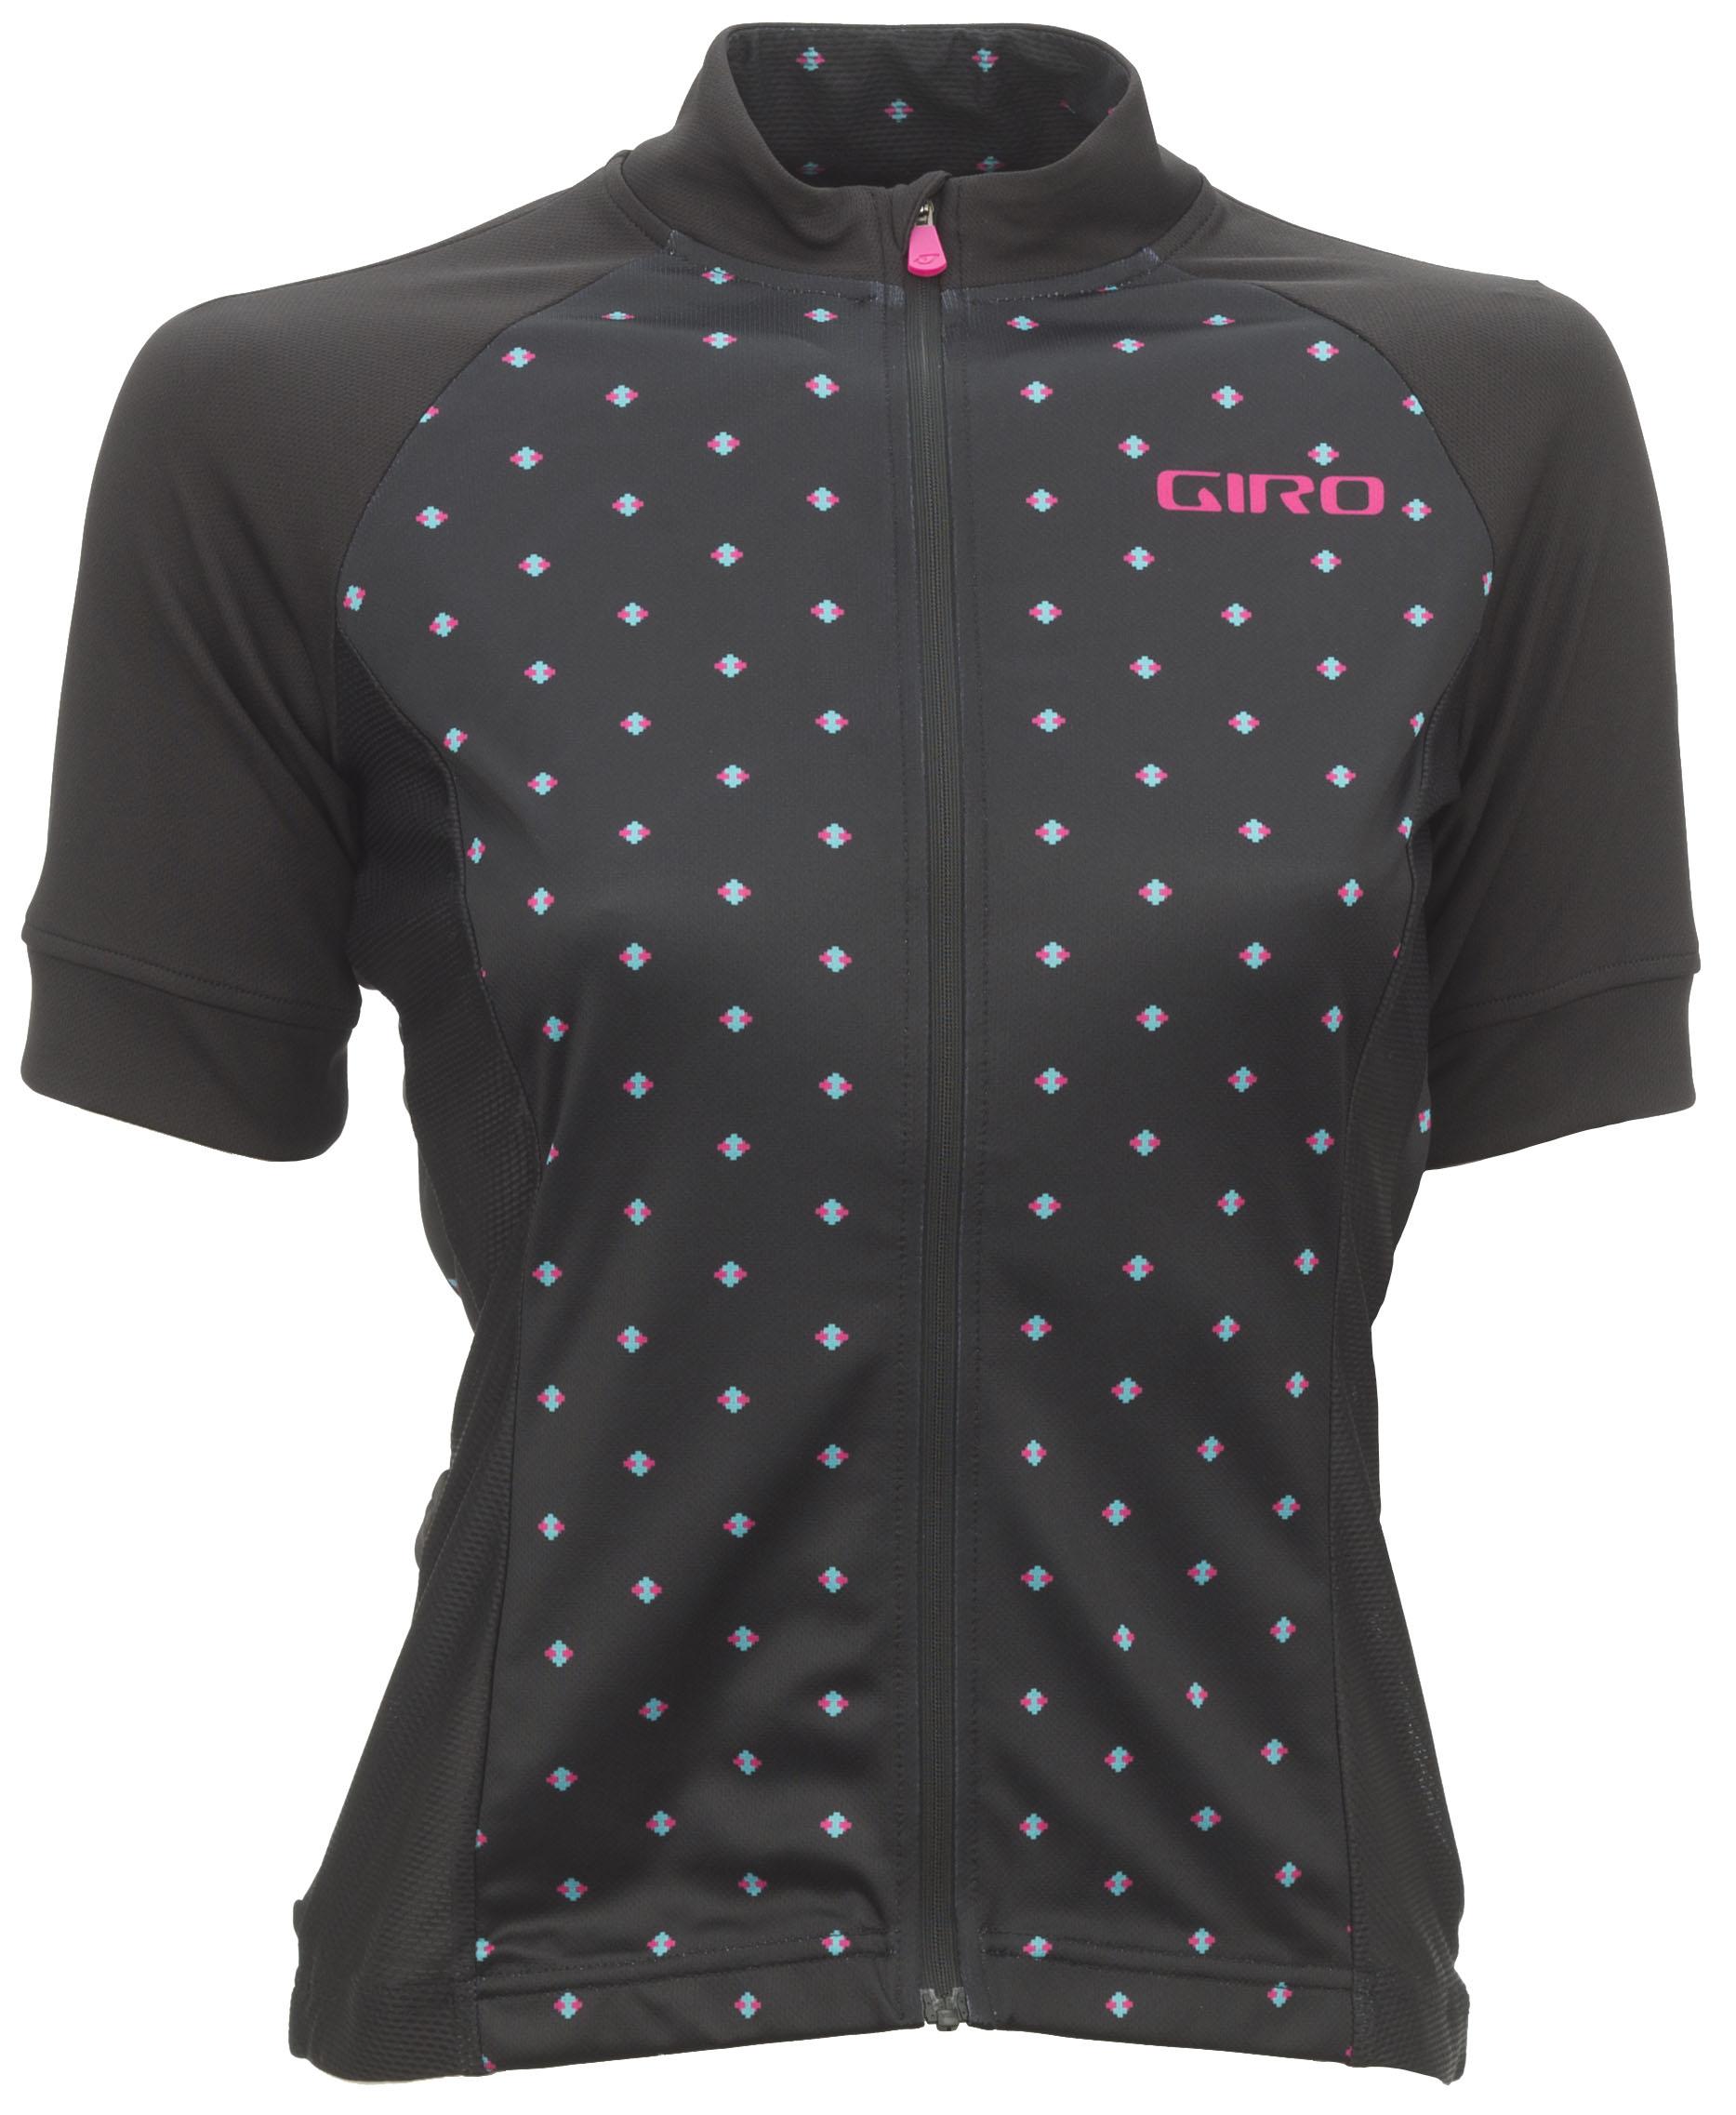 Giro Women's Sport Sub Crossfade Jersey